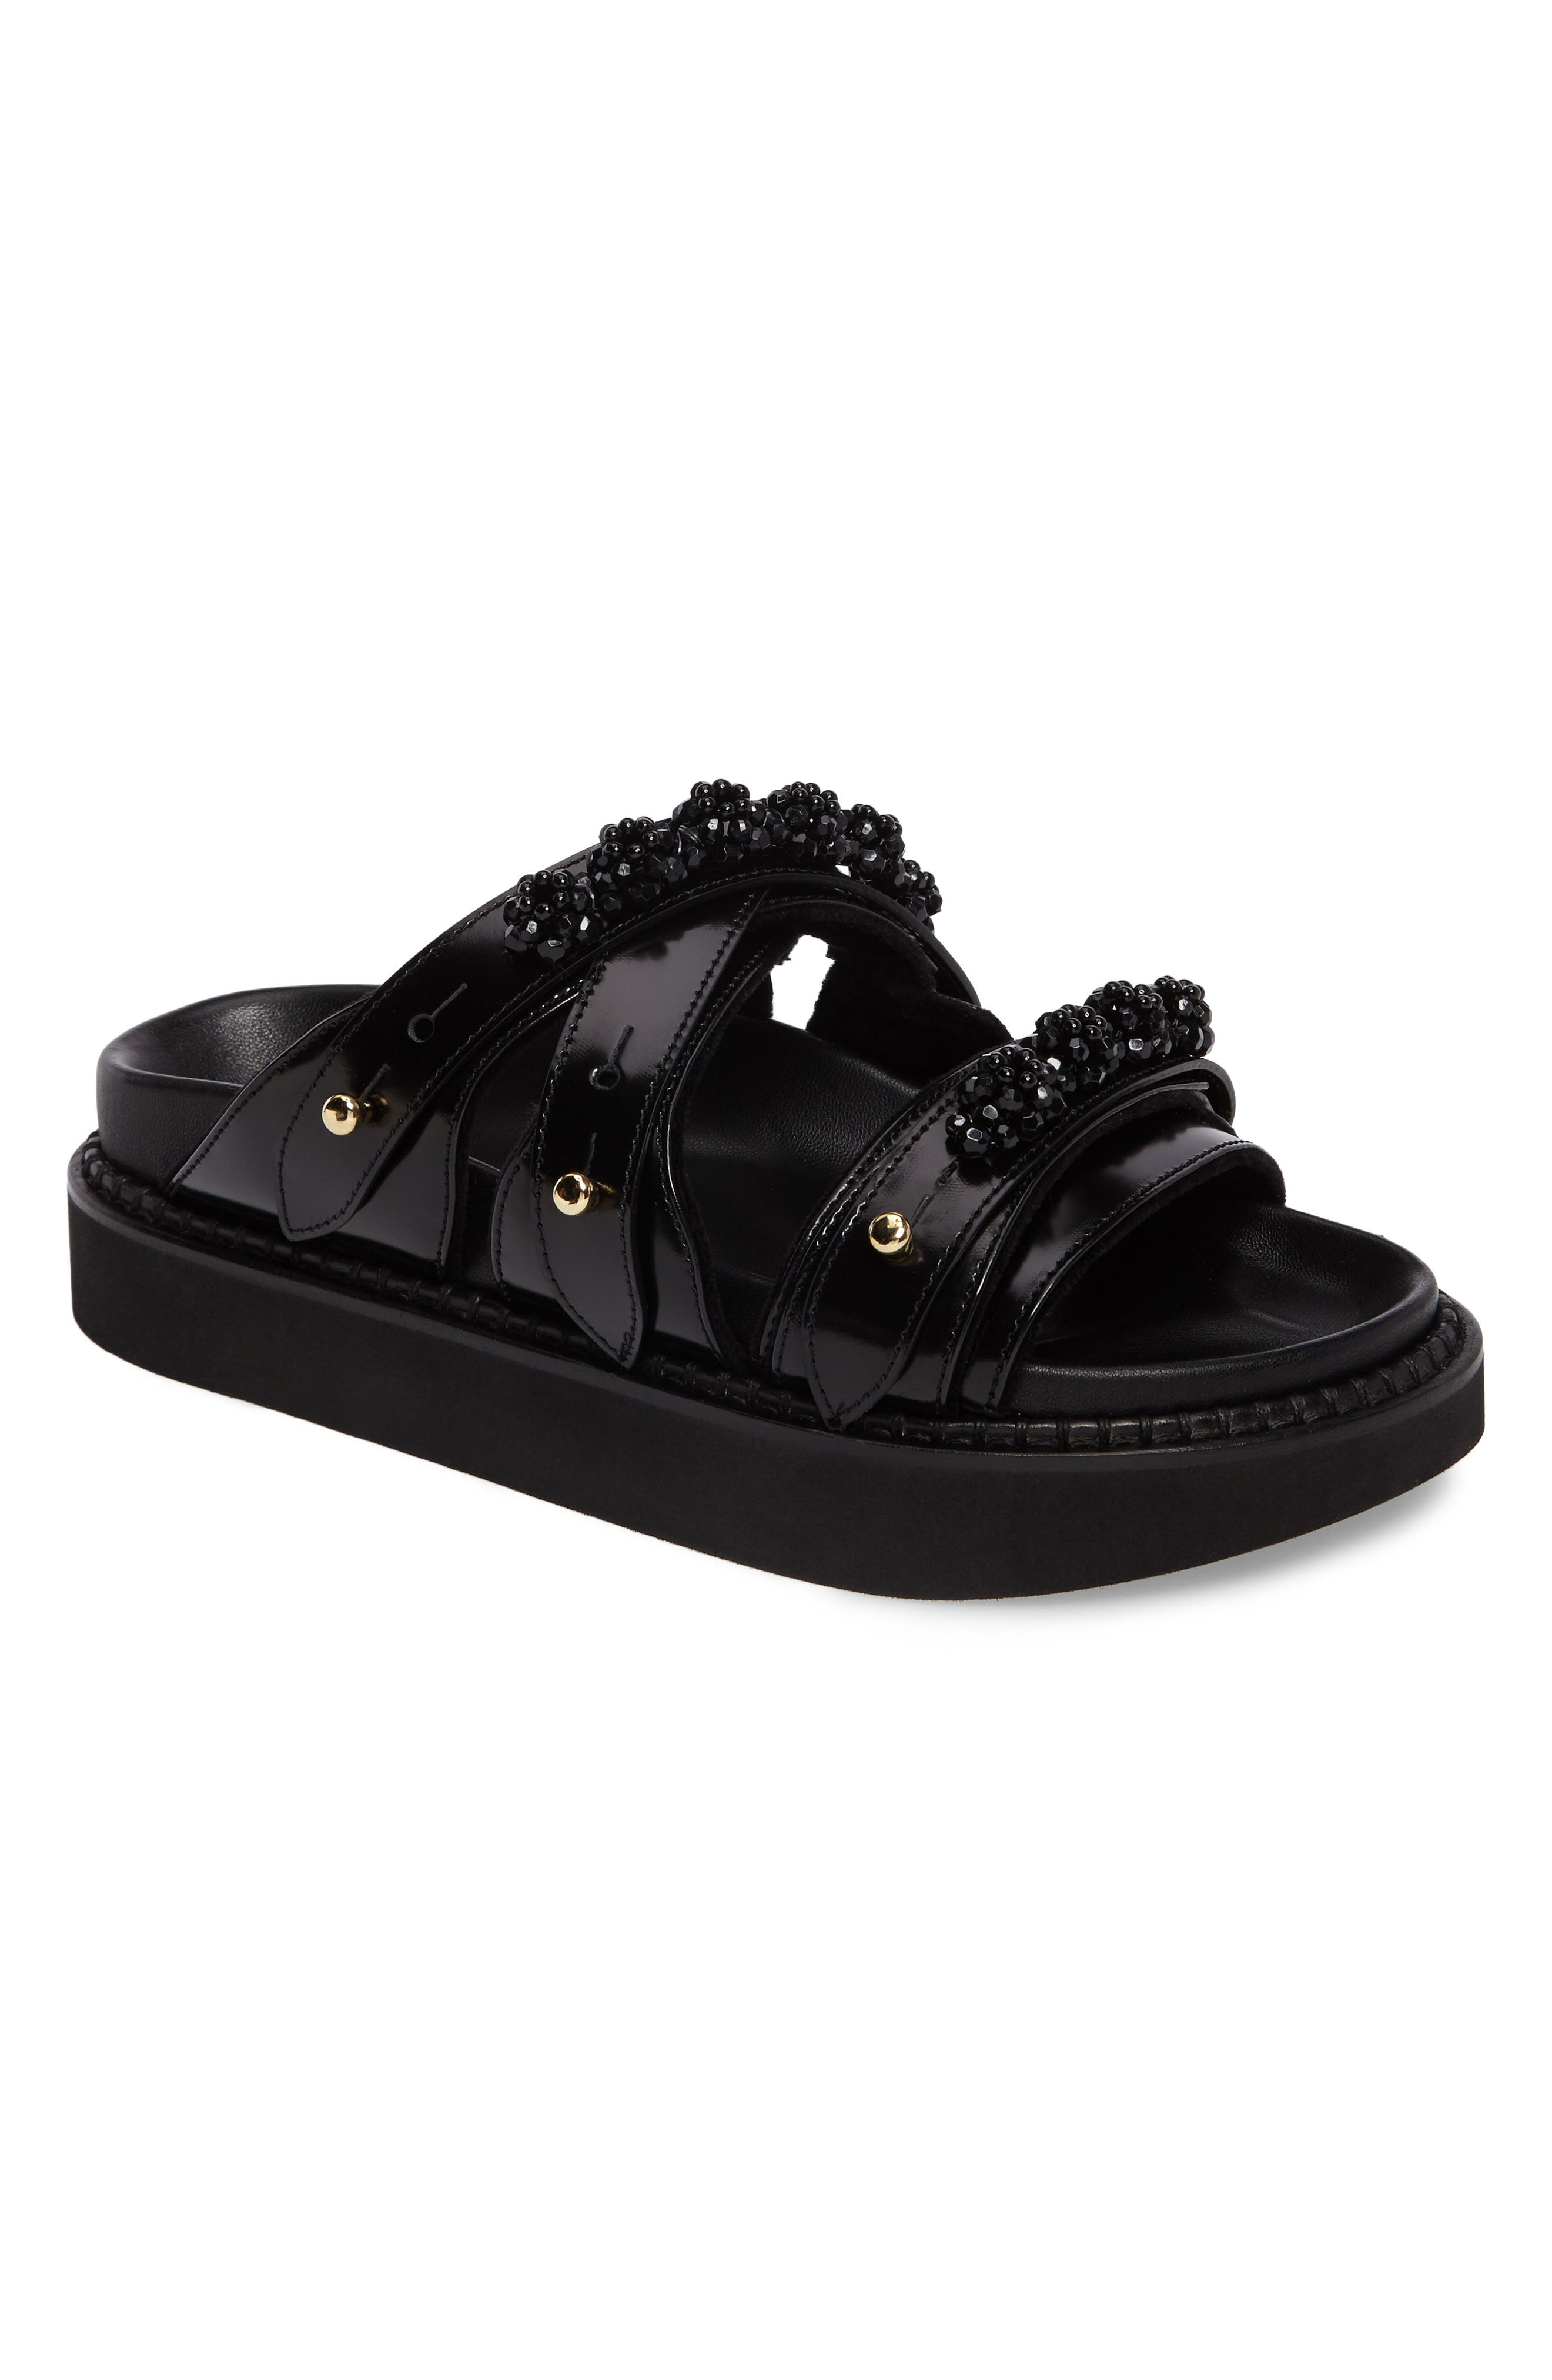 Beaded Leather Slide Sandal,                         Main,                         color, Black